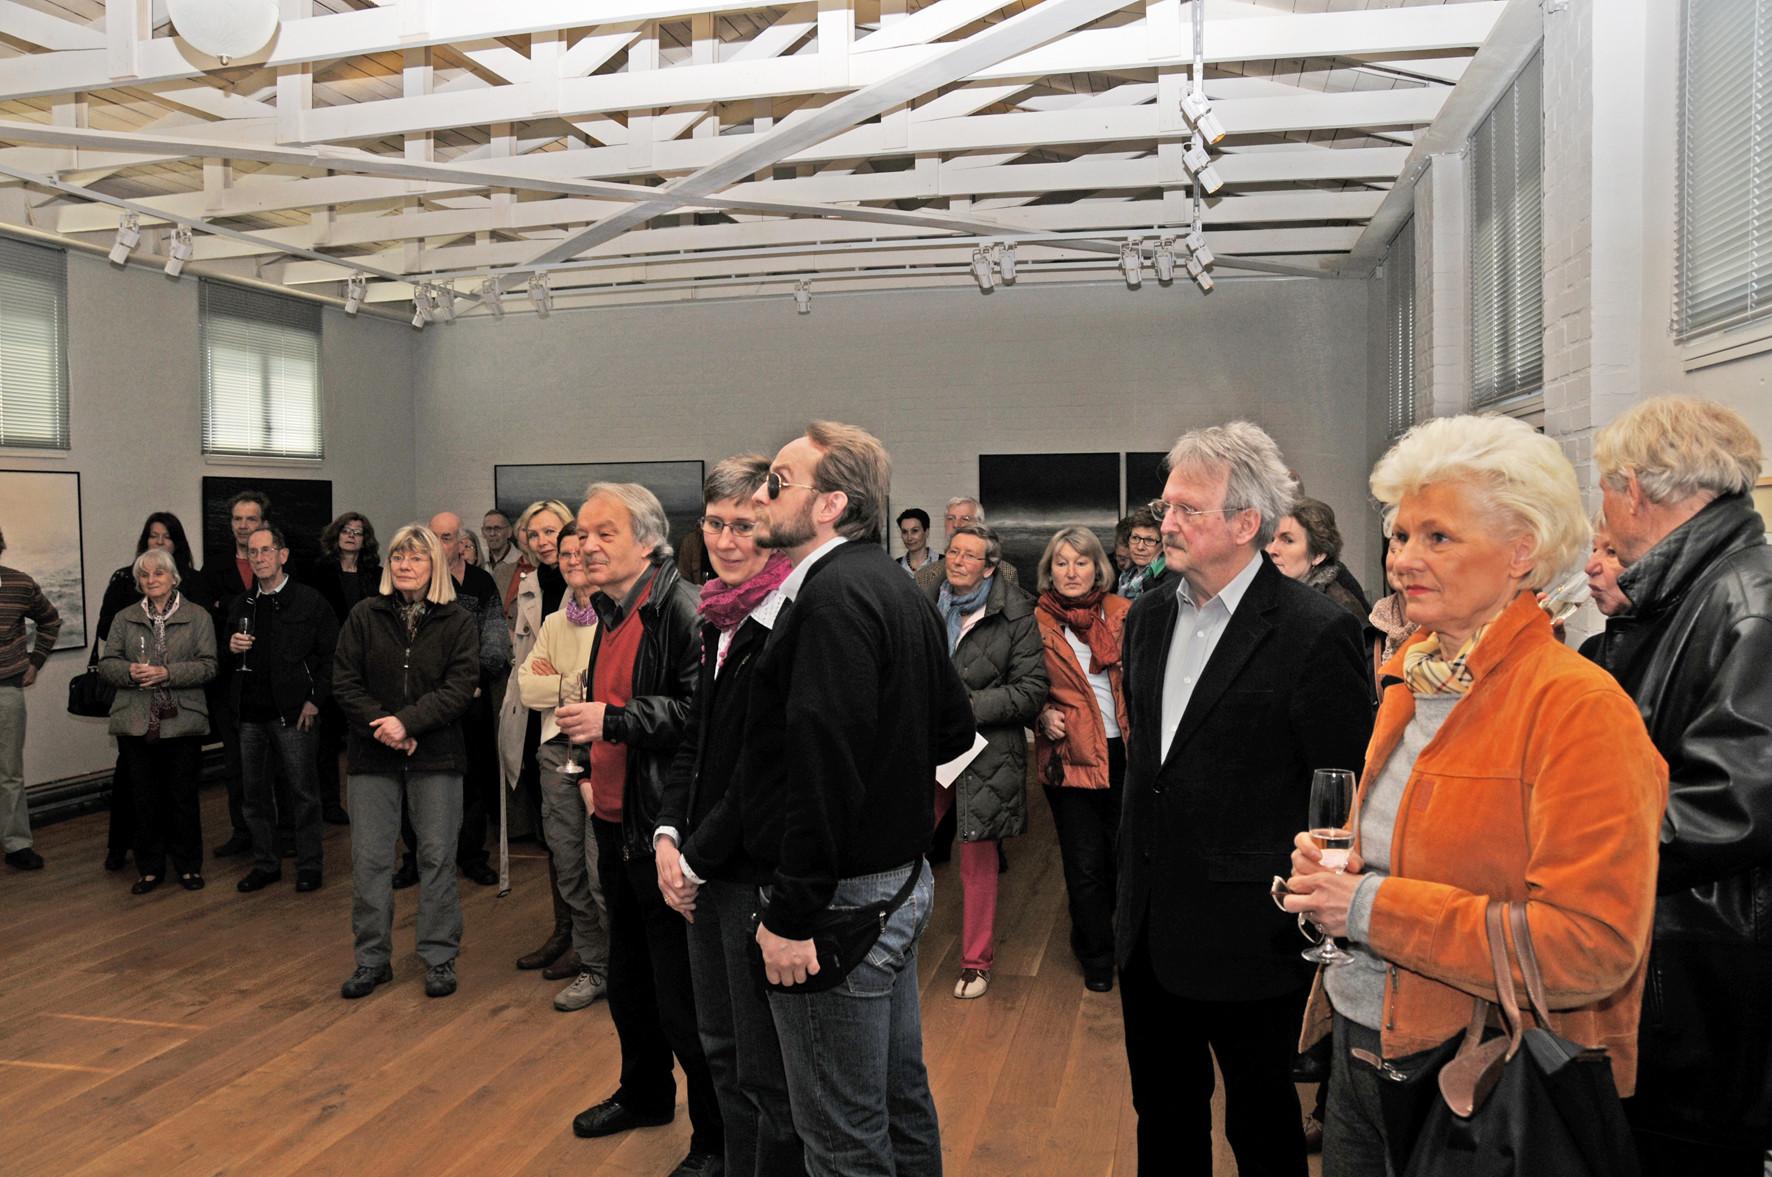 """LANDSCHAFTSBILDER"" Galerie Essigfabrik, Lübeck, Vernissage, April 2012"